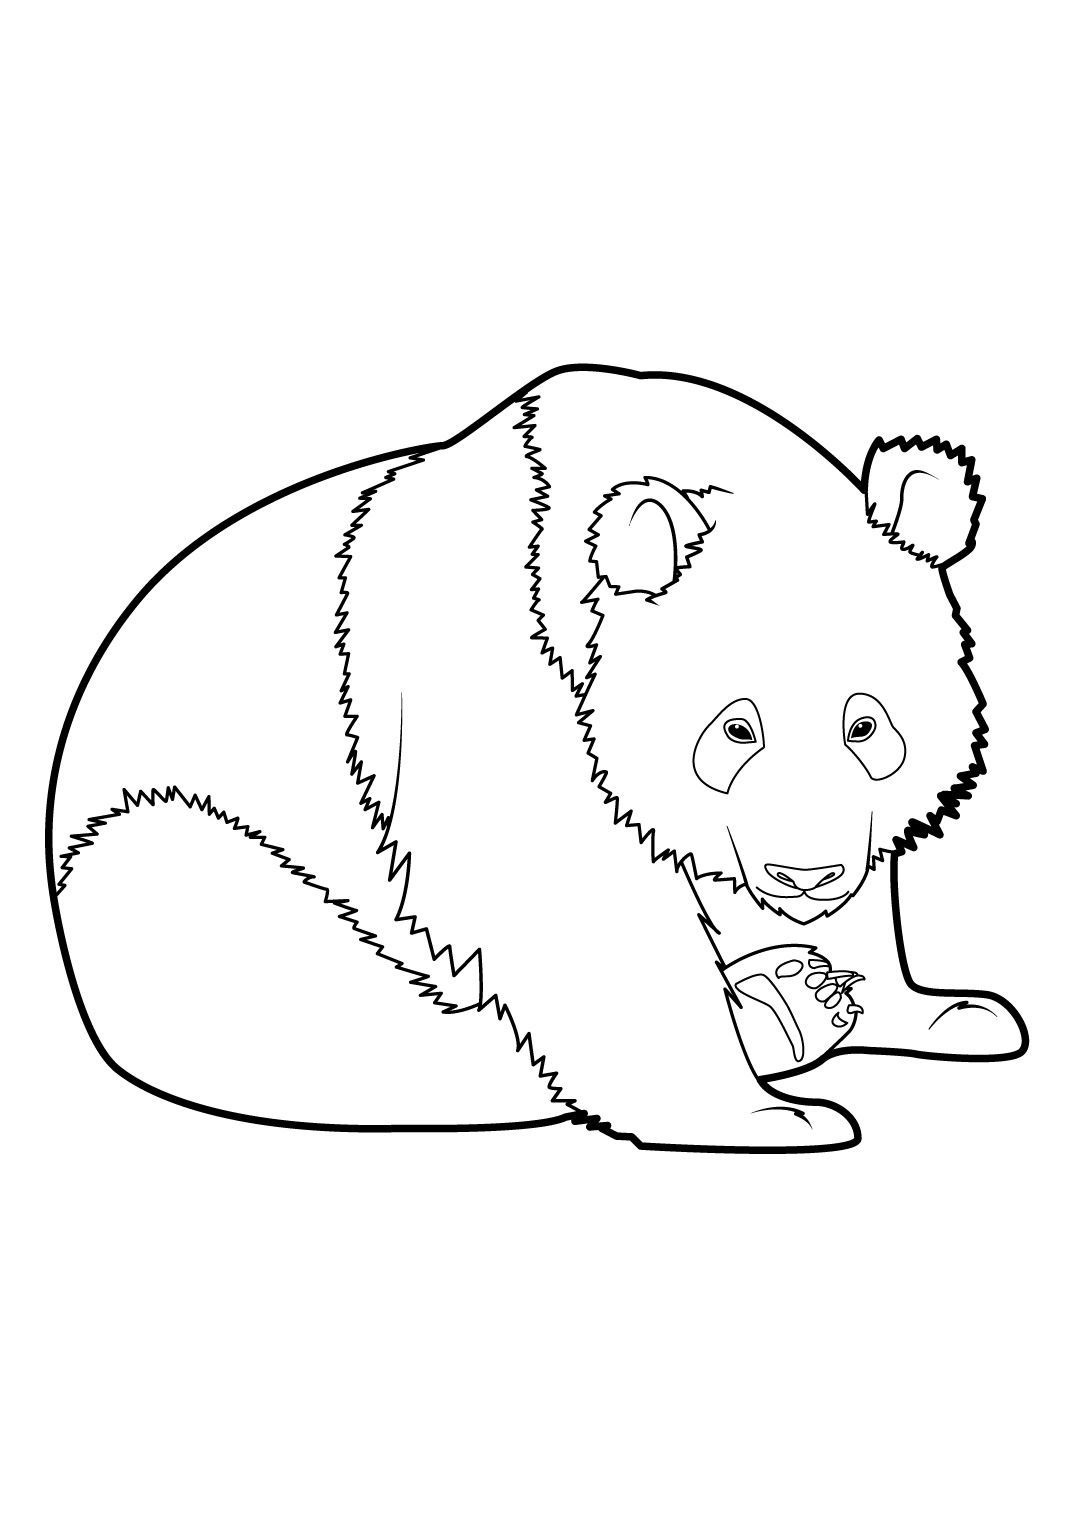 Coloriage Panda 8 - Coloriage Pandas - Coloriages Animaux